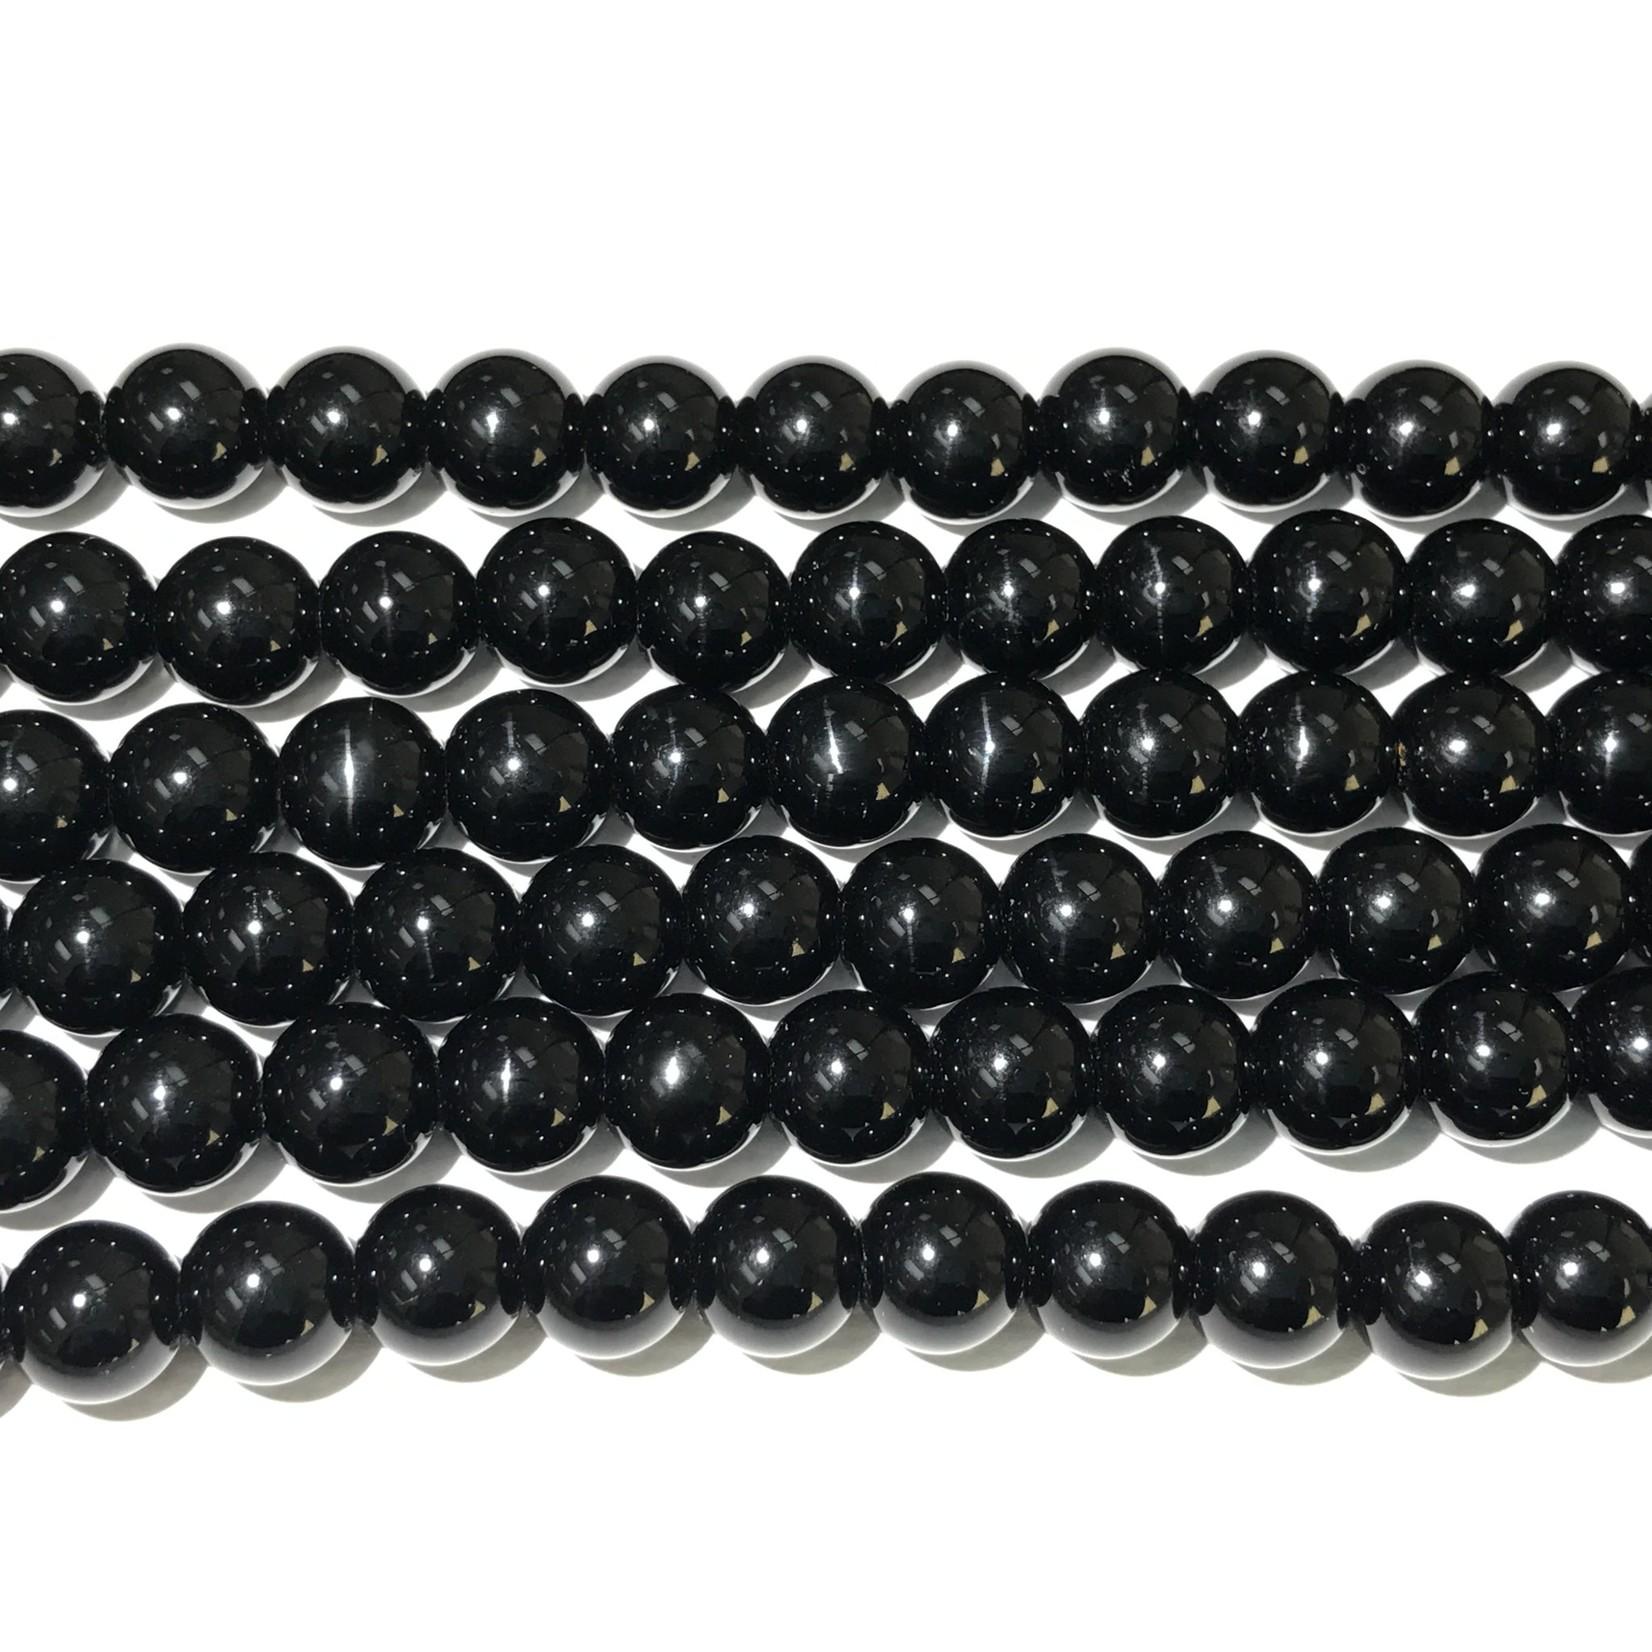 Agate Round Beads - Black - 10mm